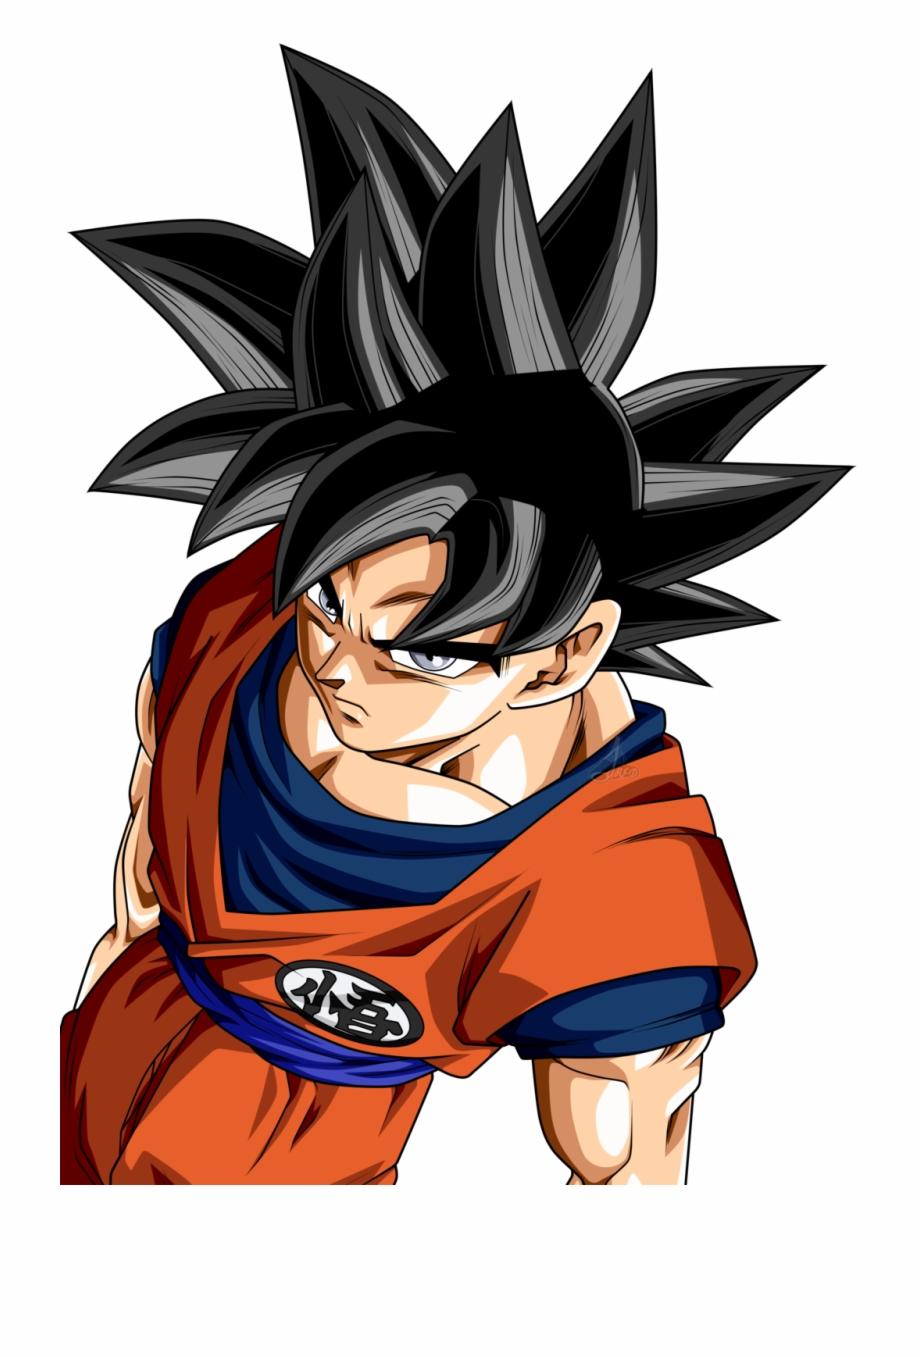 Goku migatte no gokui clipart vector black and white Goku Migatte No Gokui Wallpaper Hd - Iphone Dragon Ball Súper Free ... vector black and white